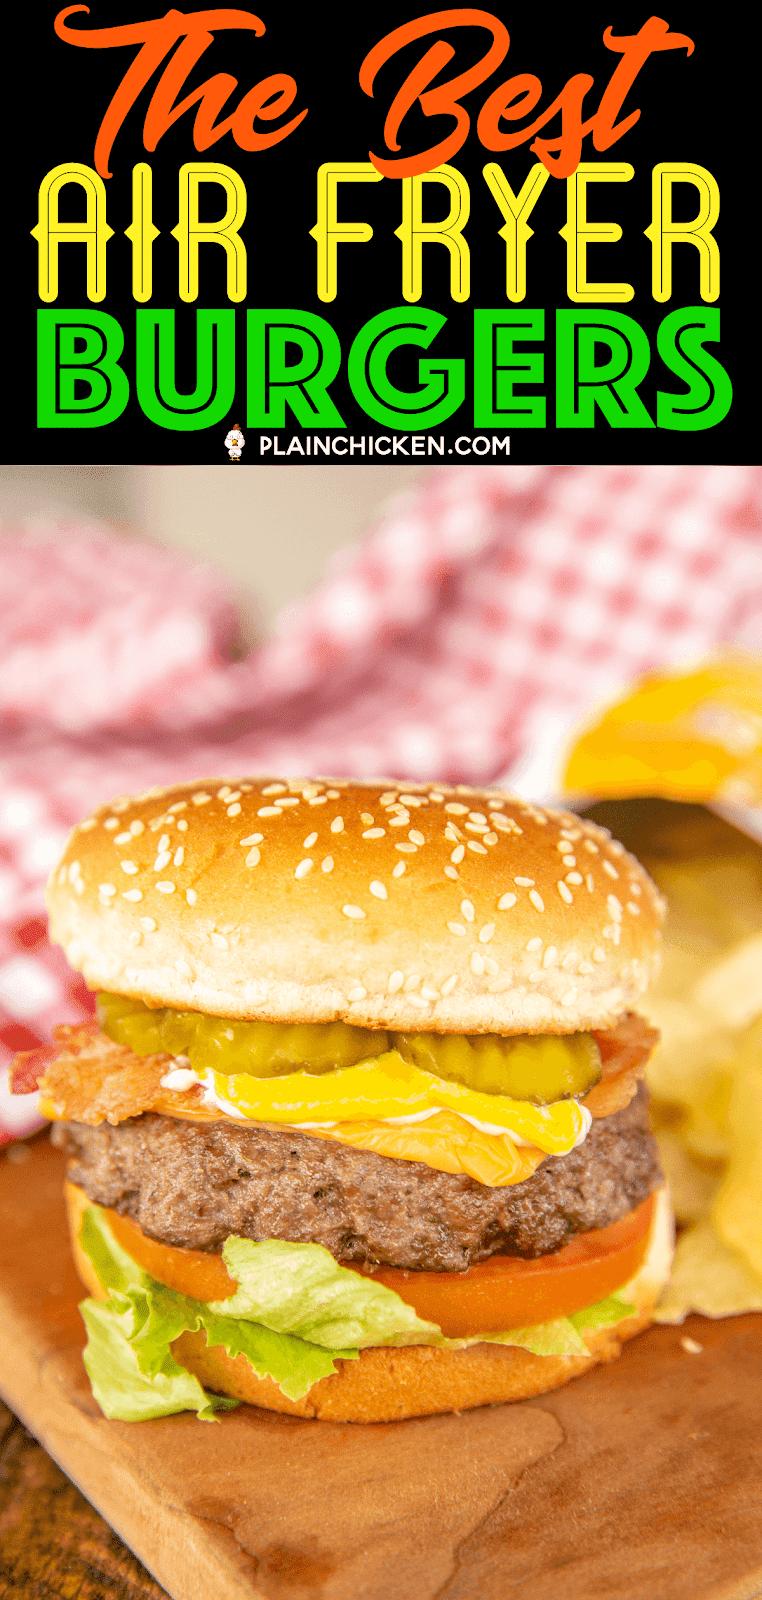 hamburger on a bun with chips